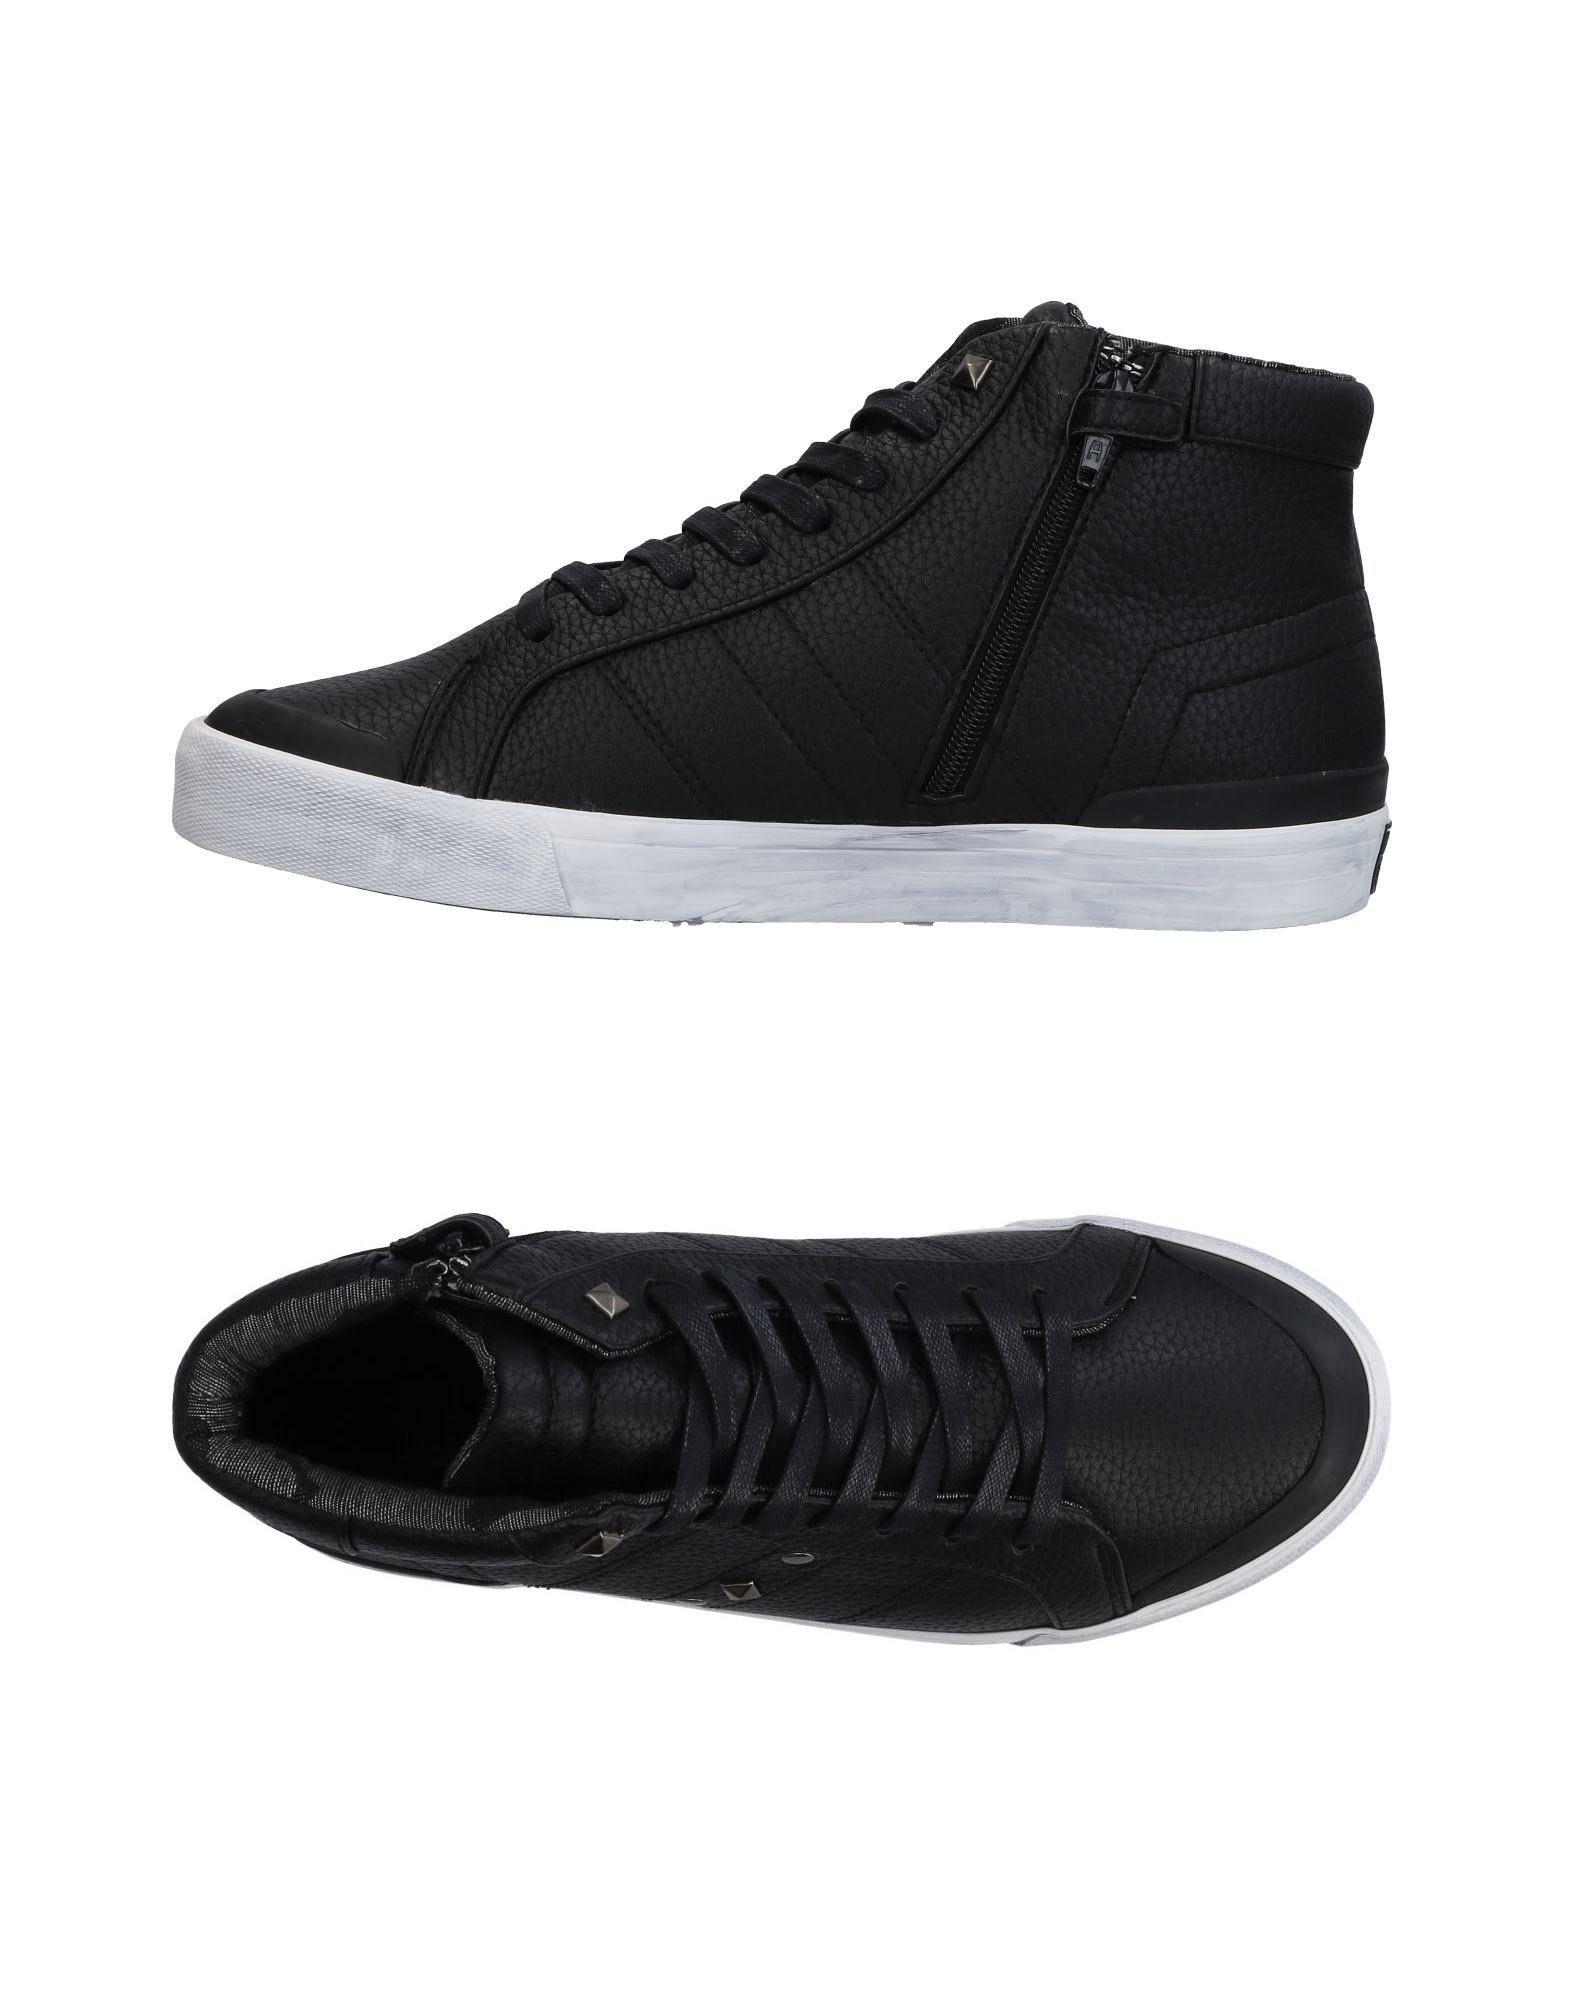 Sneakers Gioseppo Homme - Sneakers Gioseppo  Noir Confortable et belle